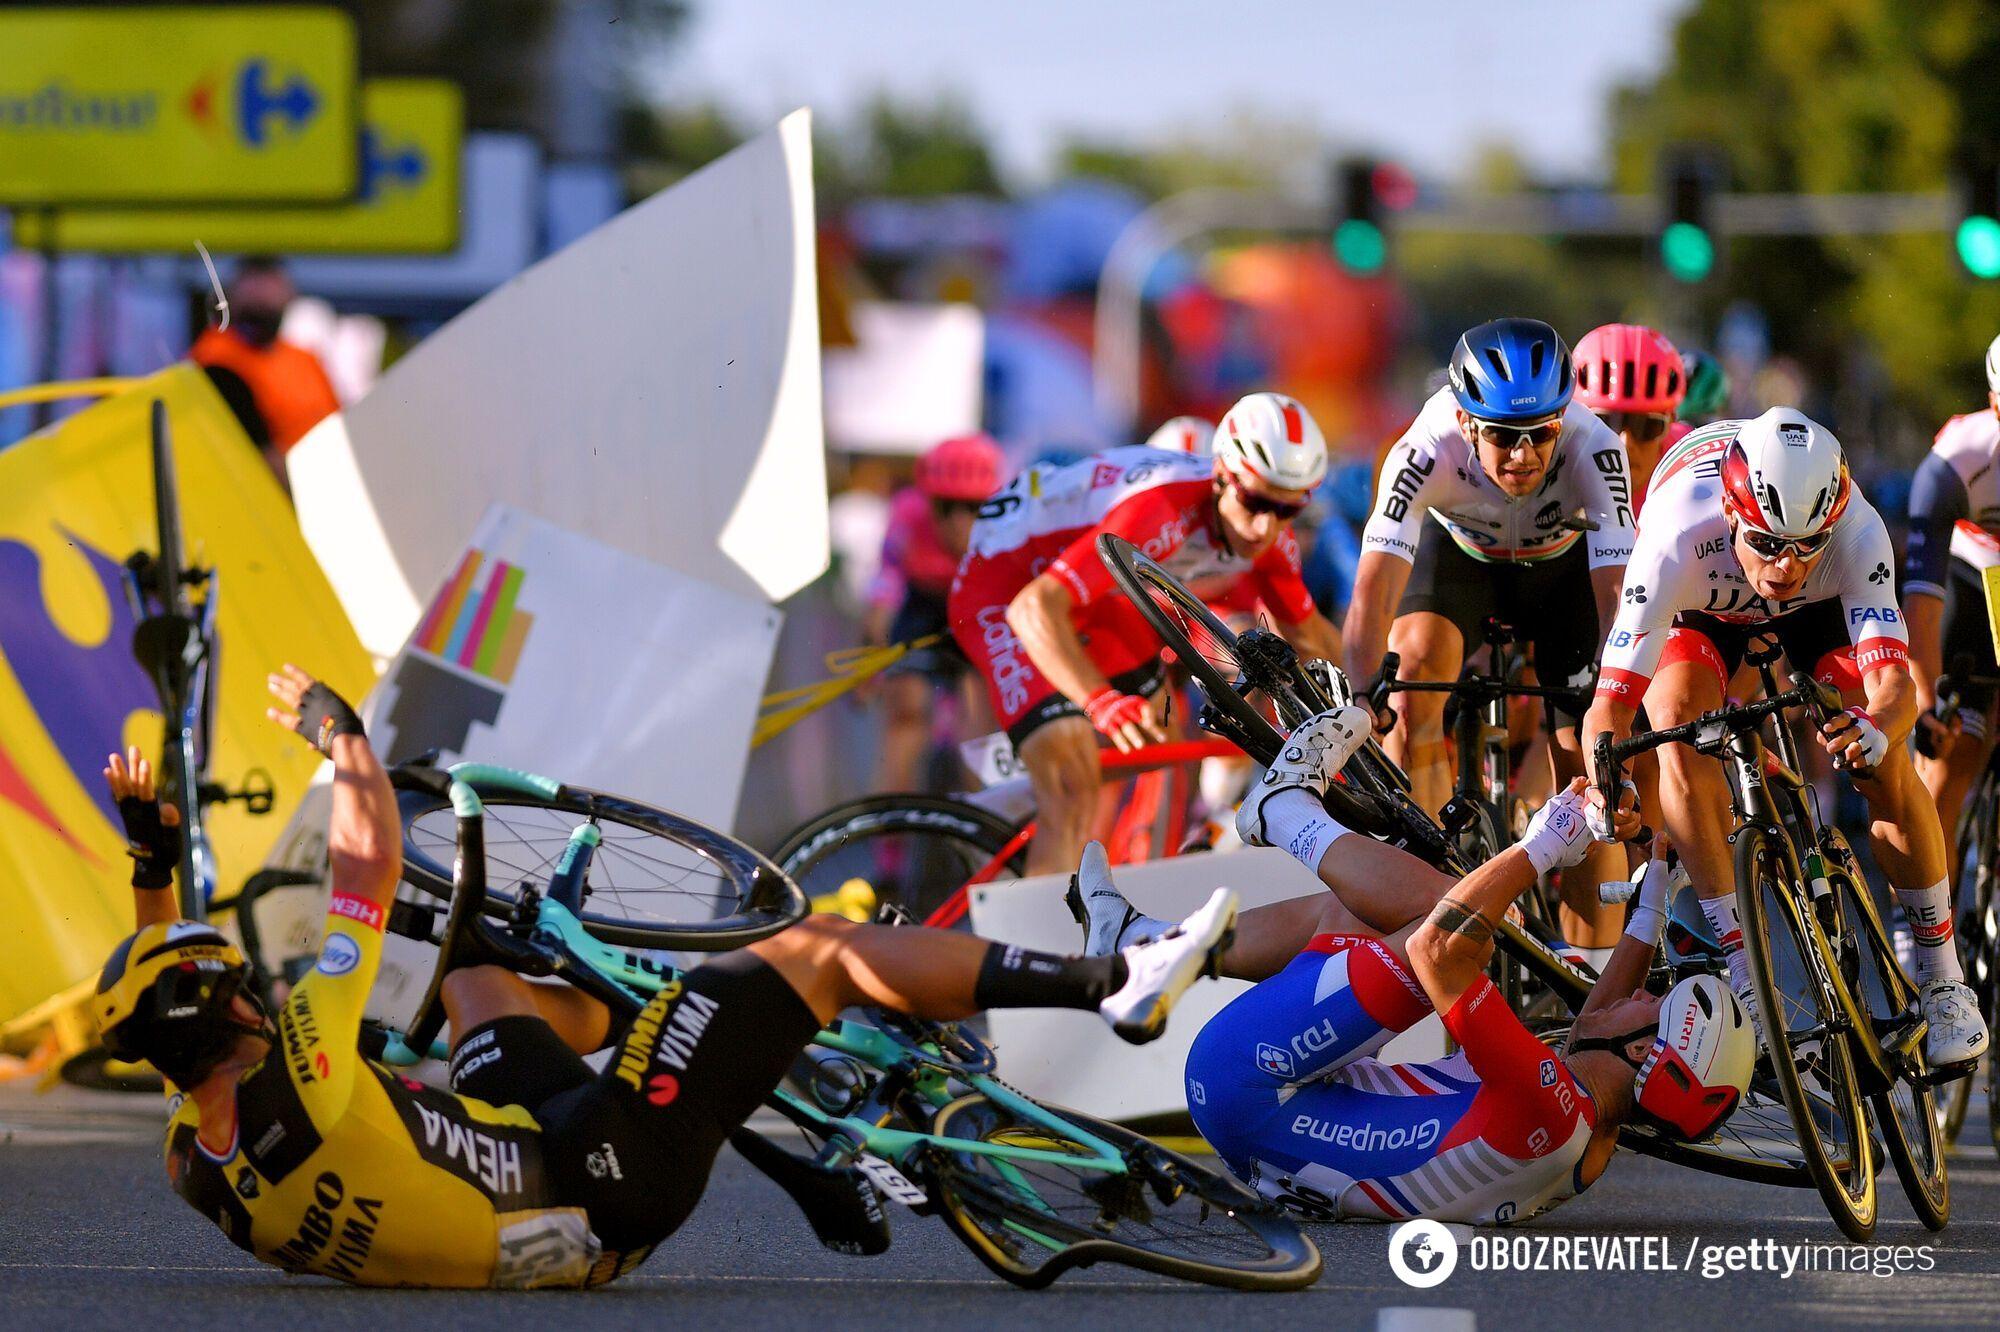 Велогонка Тур Польши: момент аварии